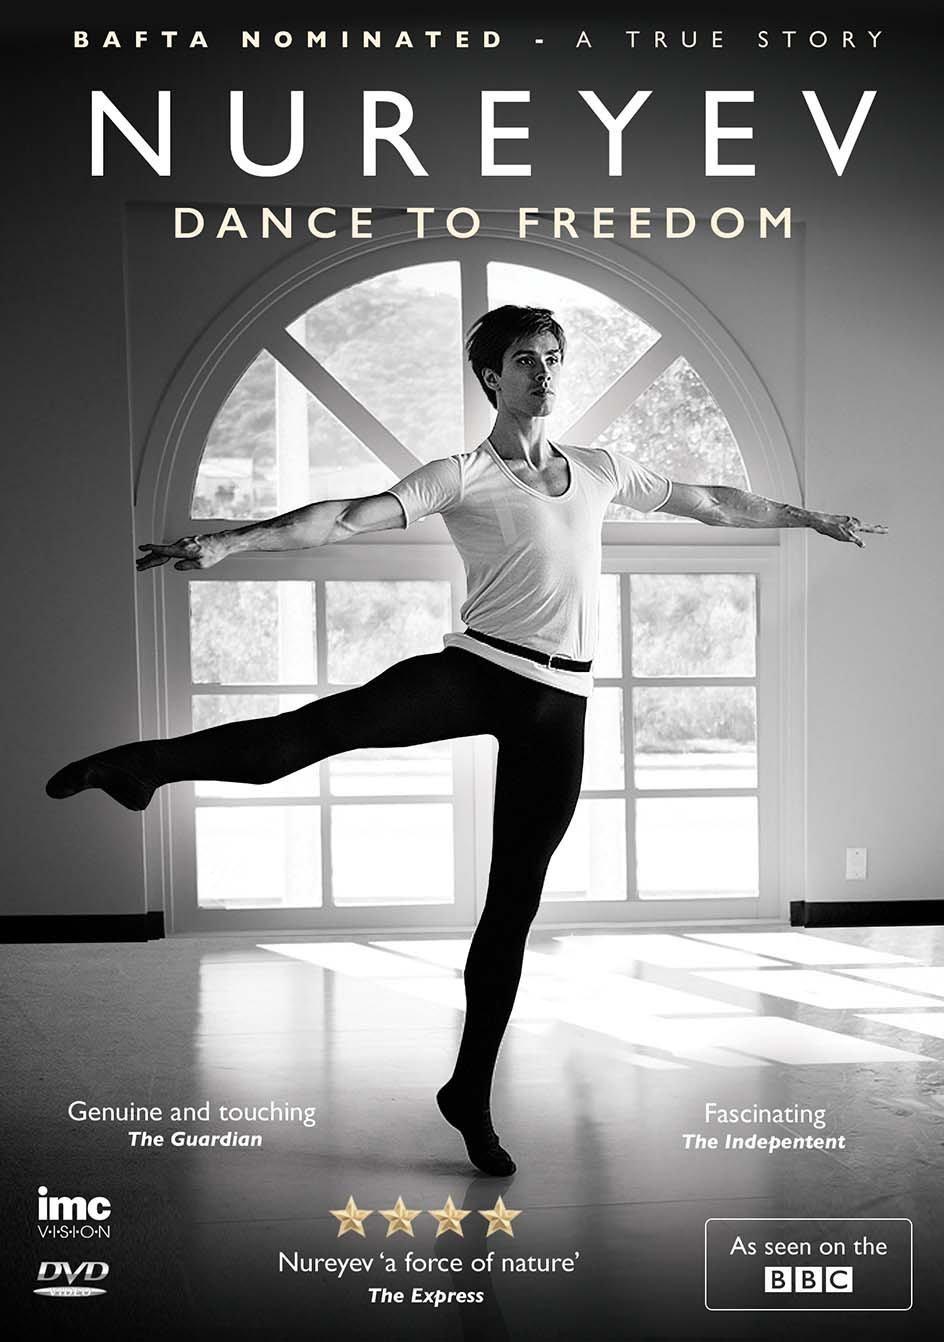 Nureyev-Dance to freedom.jpg